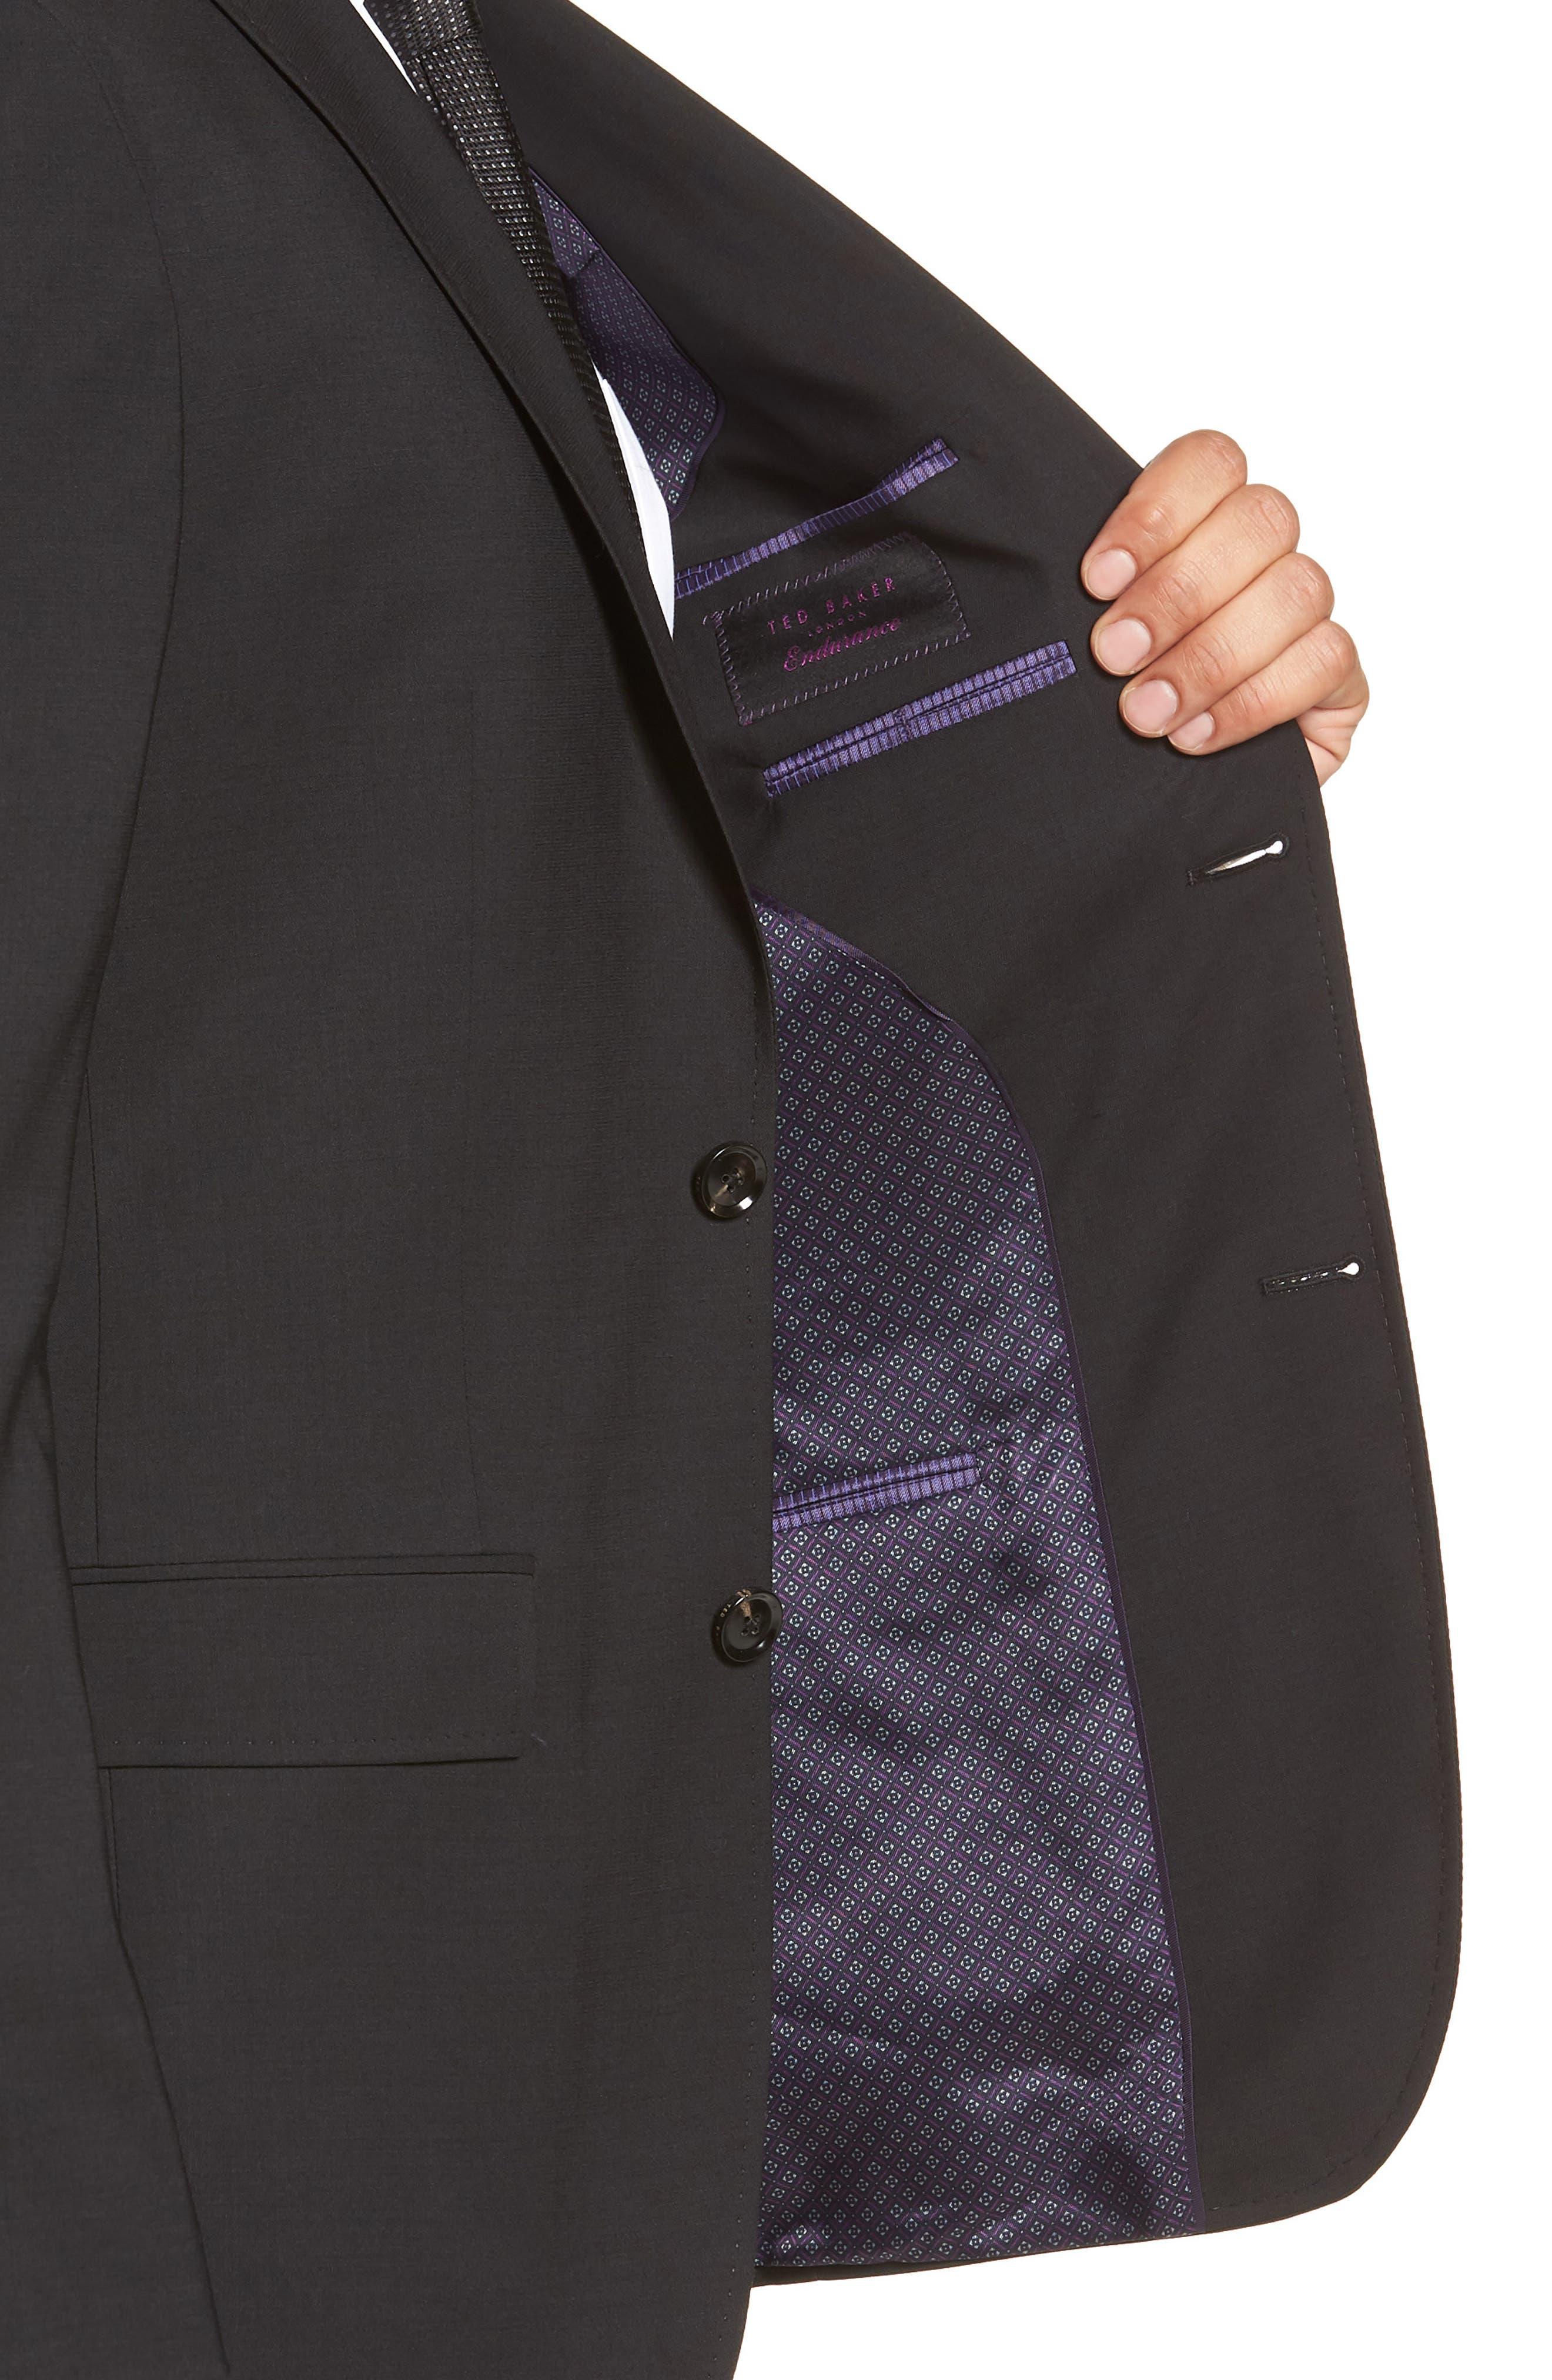 Jay Trim Fit Solid Wool Suit,                             Alternate thumbnail 4, color,                             Black